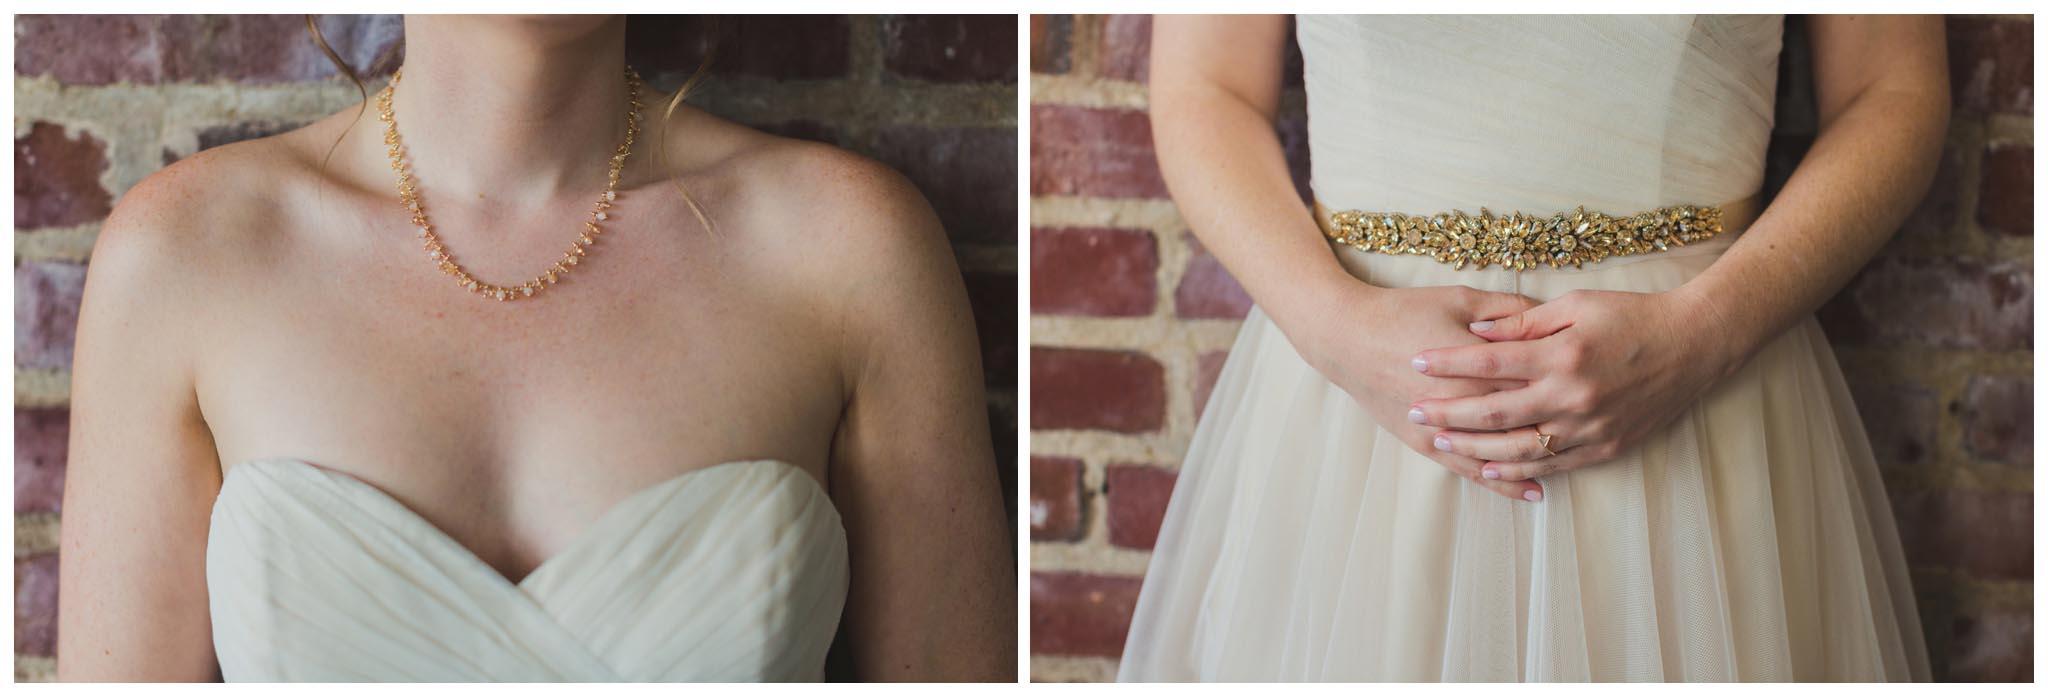 Bride, BHLDN, accessories